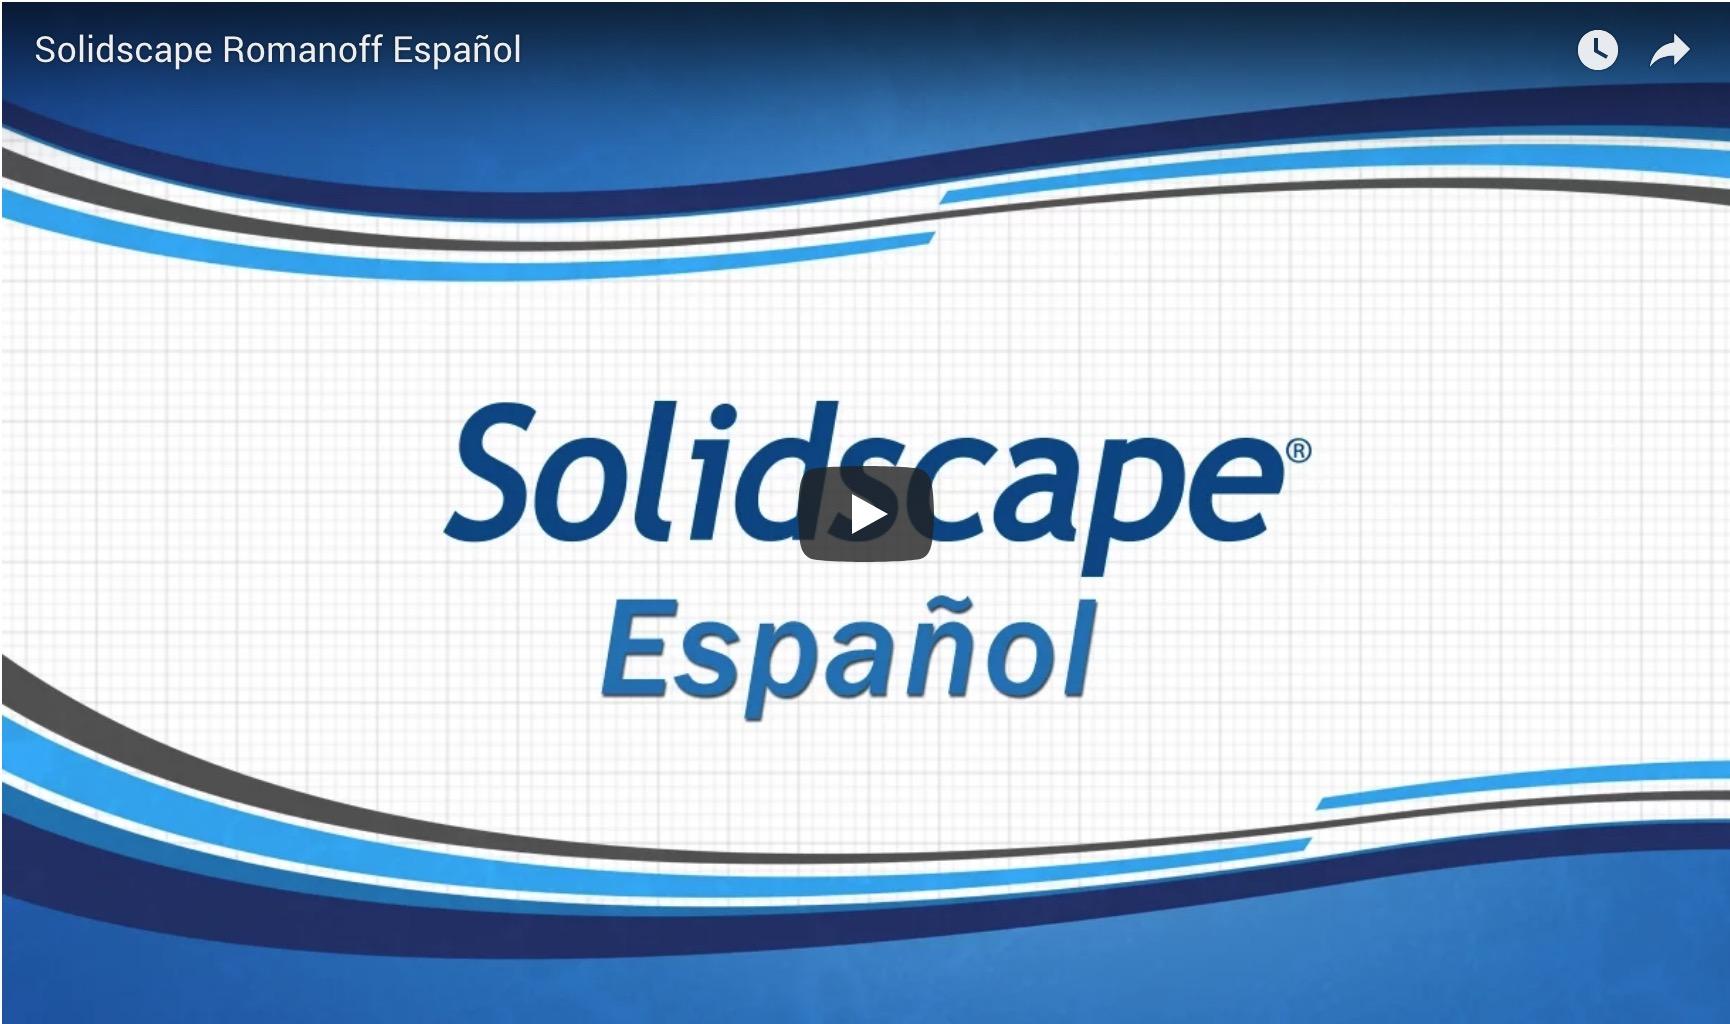 Solidscape Romanoff Español